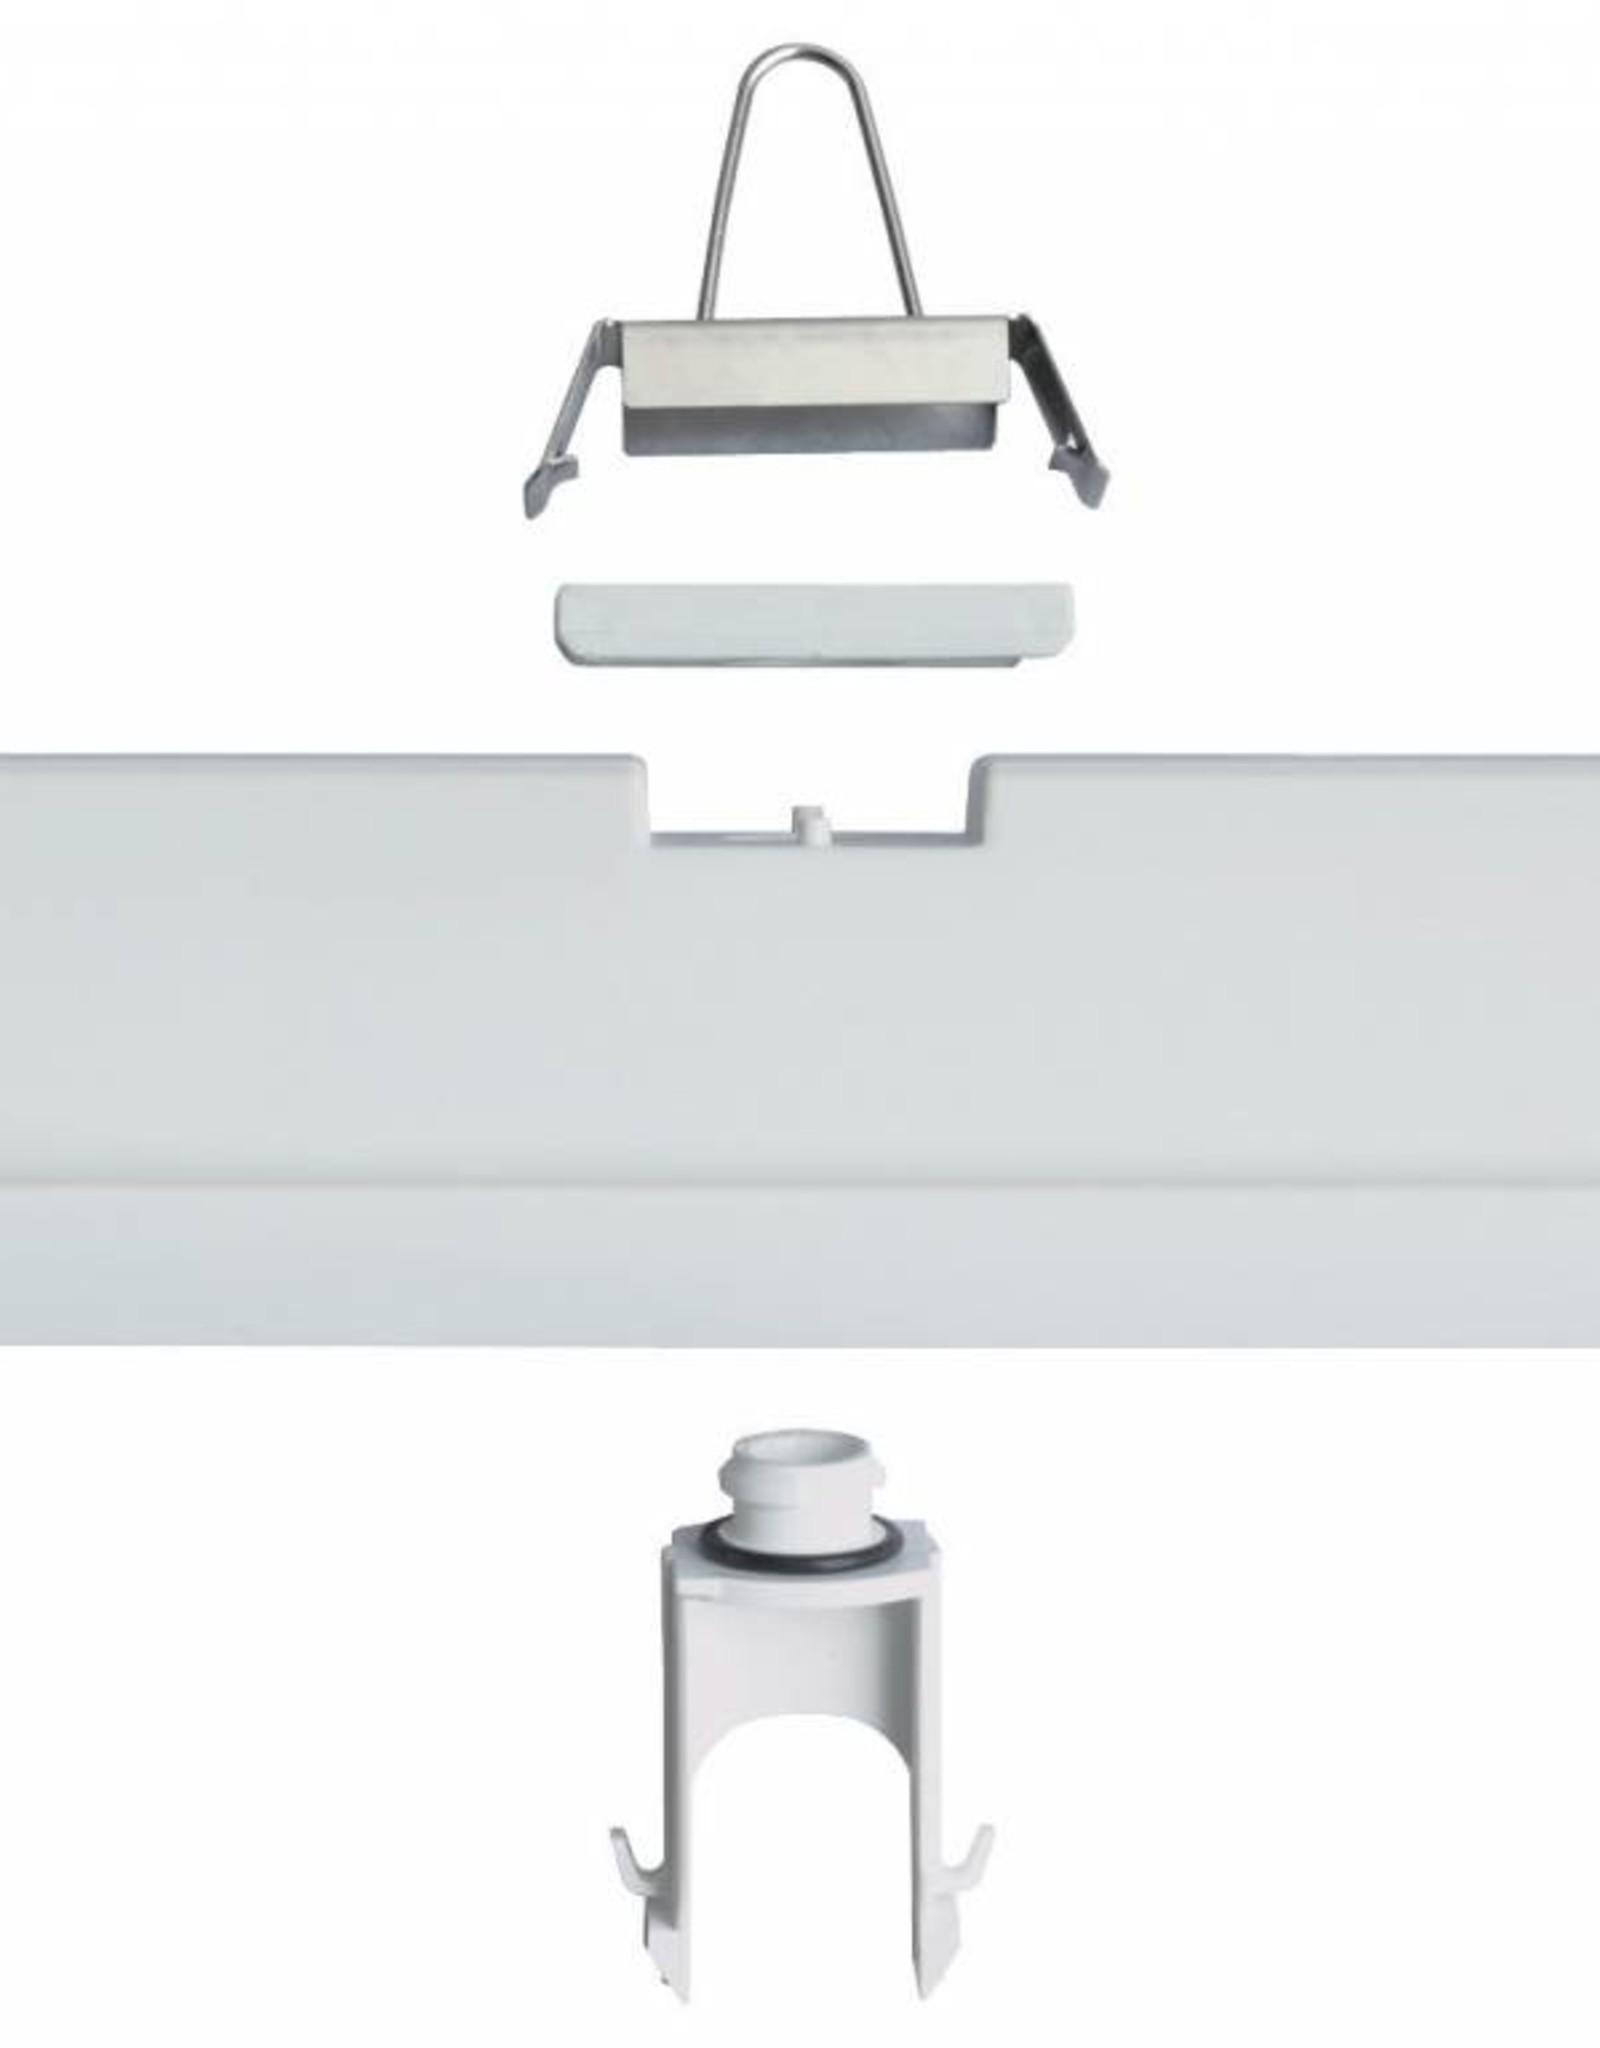 Prima 2x28W HE - ABS - inox clips - HF ballast